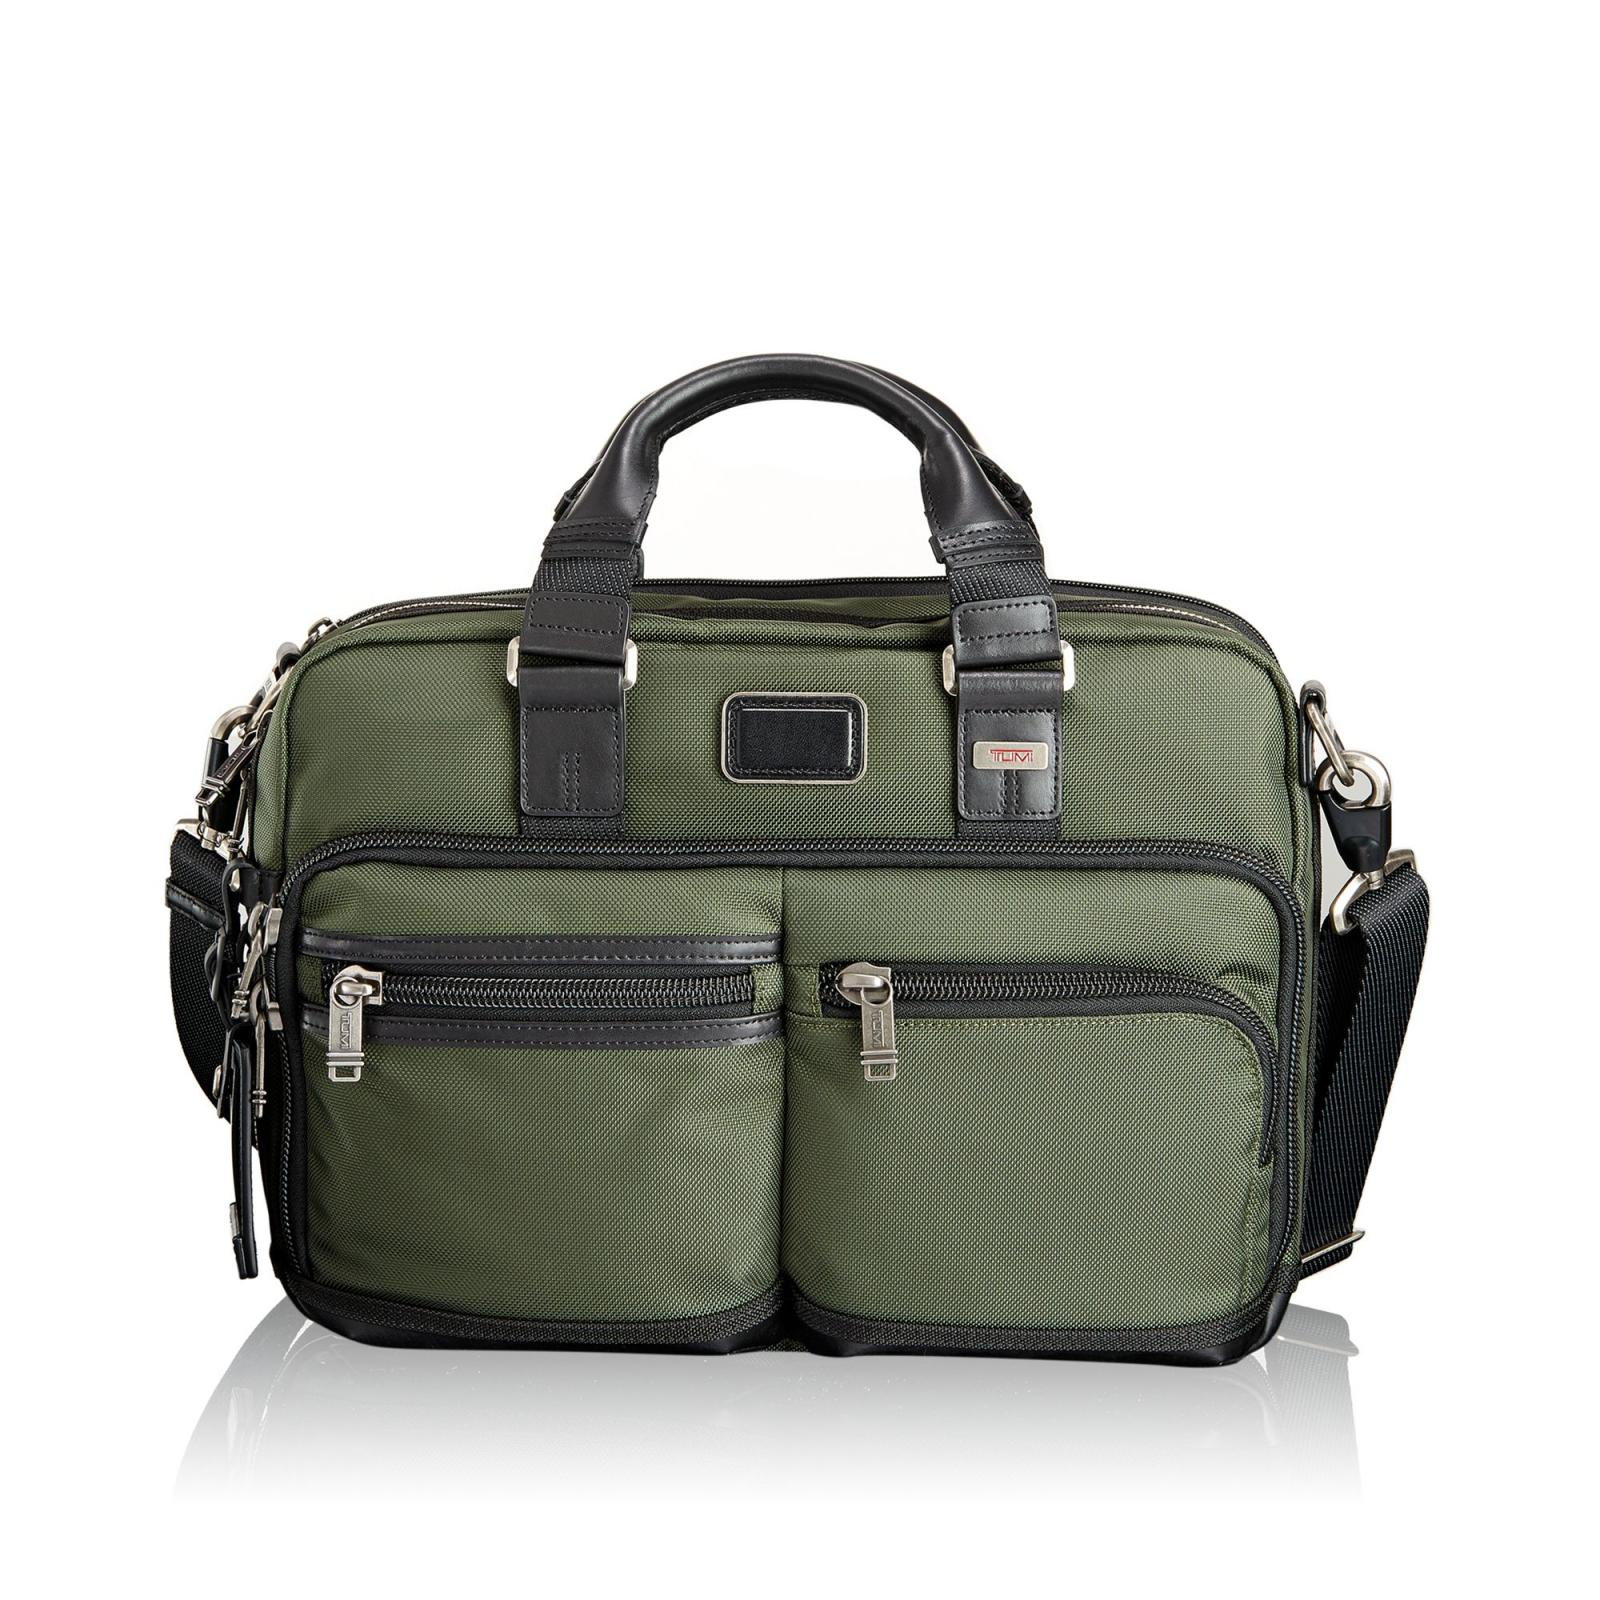 United Check Bag Fee Tumi Andersen Slim Commuter Brief Laptop Carry Bag New Ebay